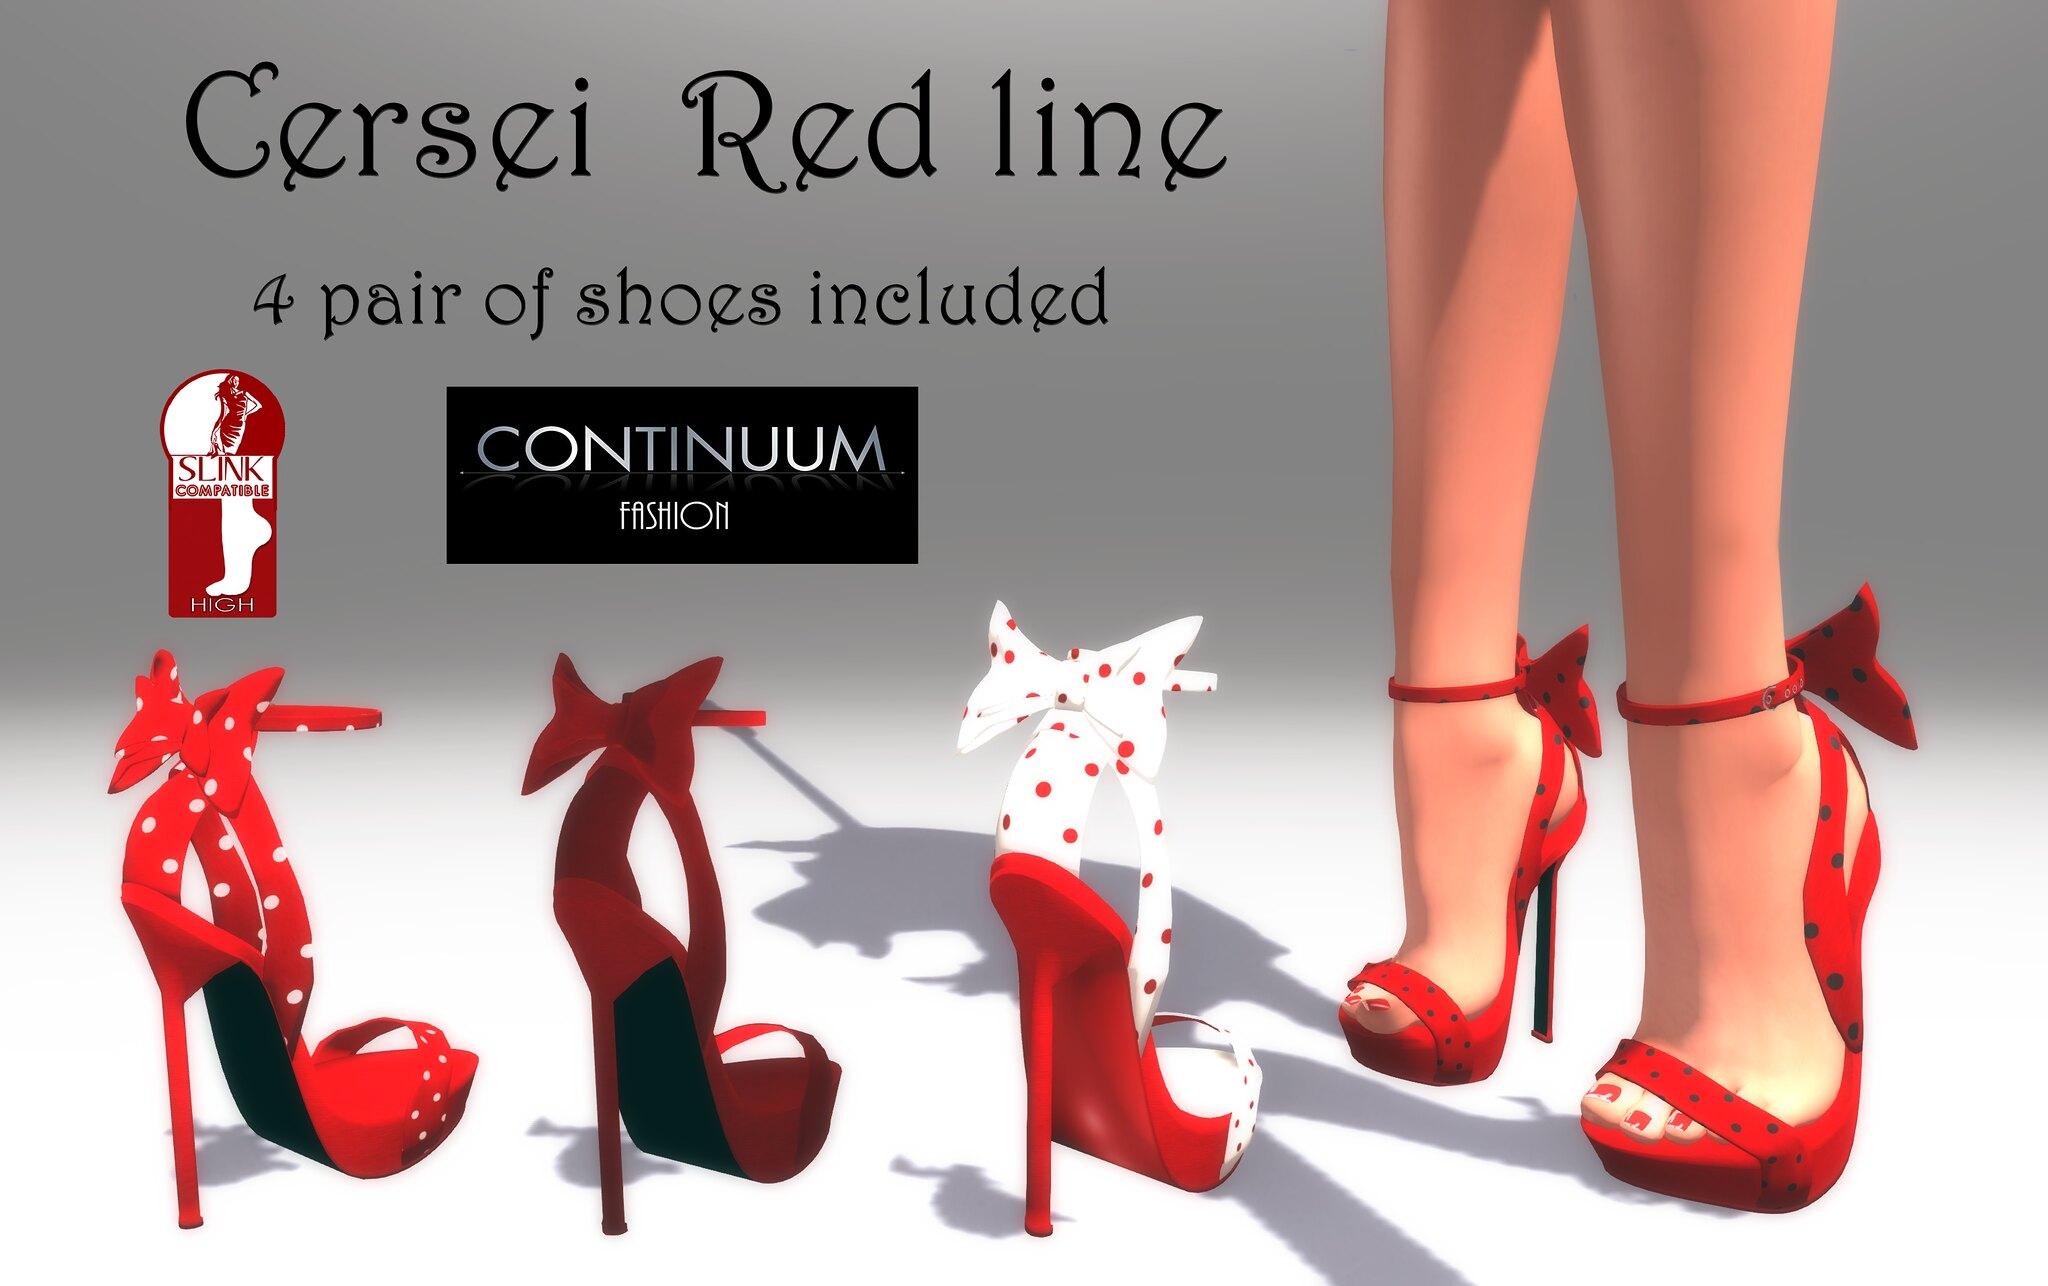 Continuum - CERSEI RED LINE adv